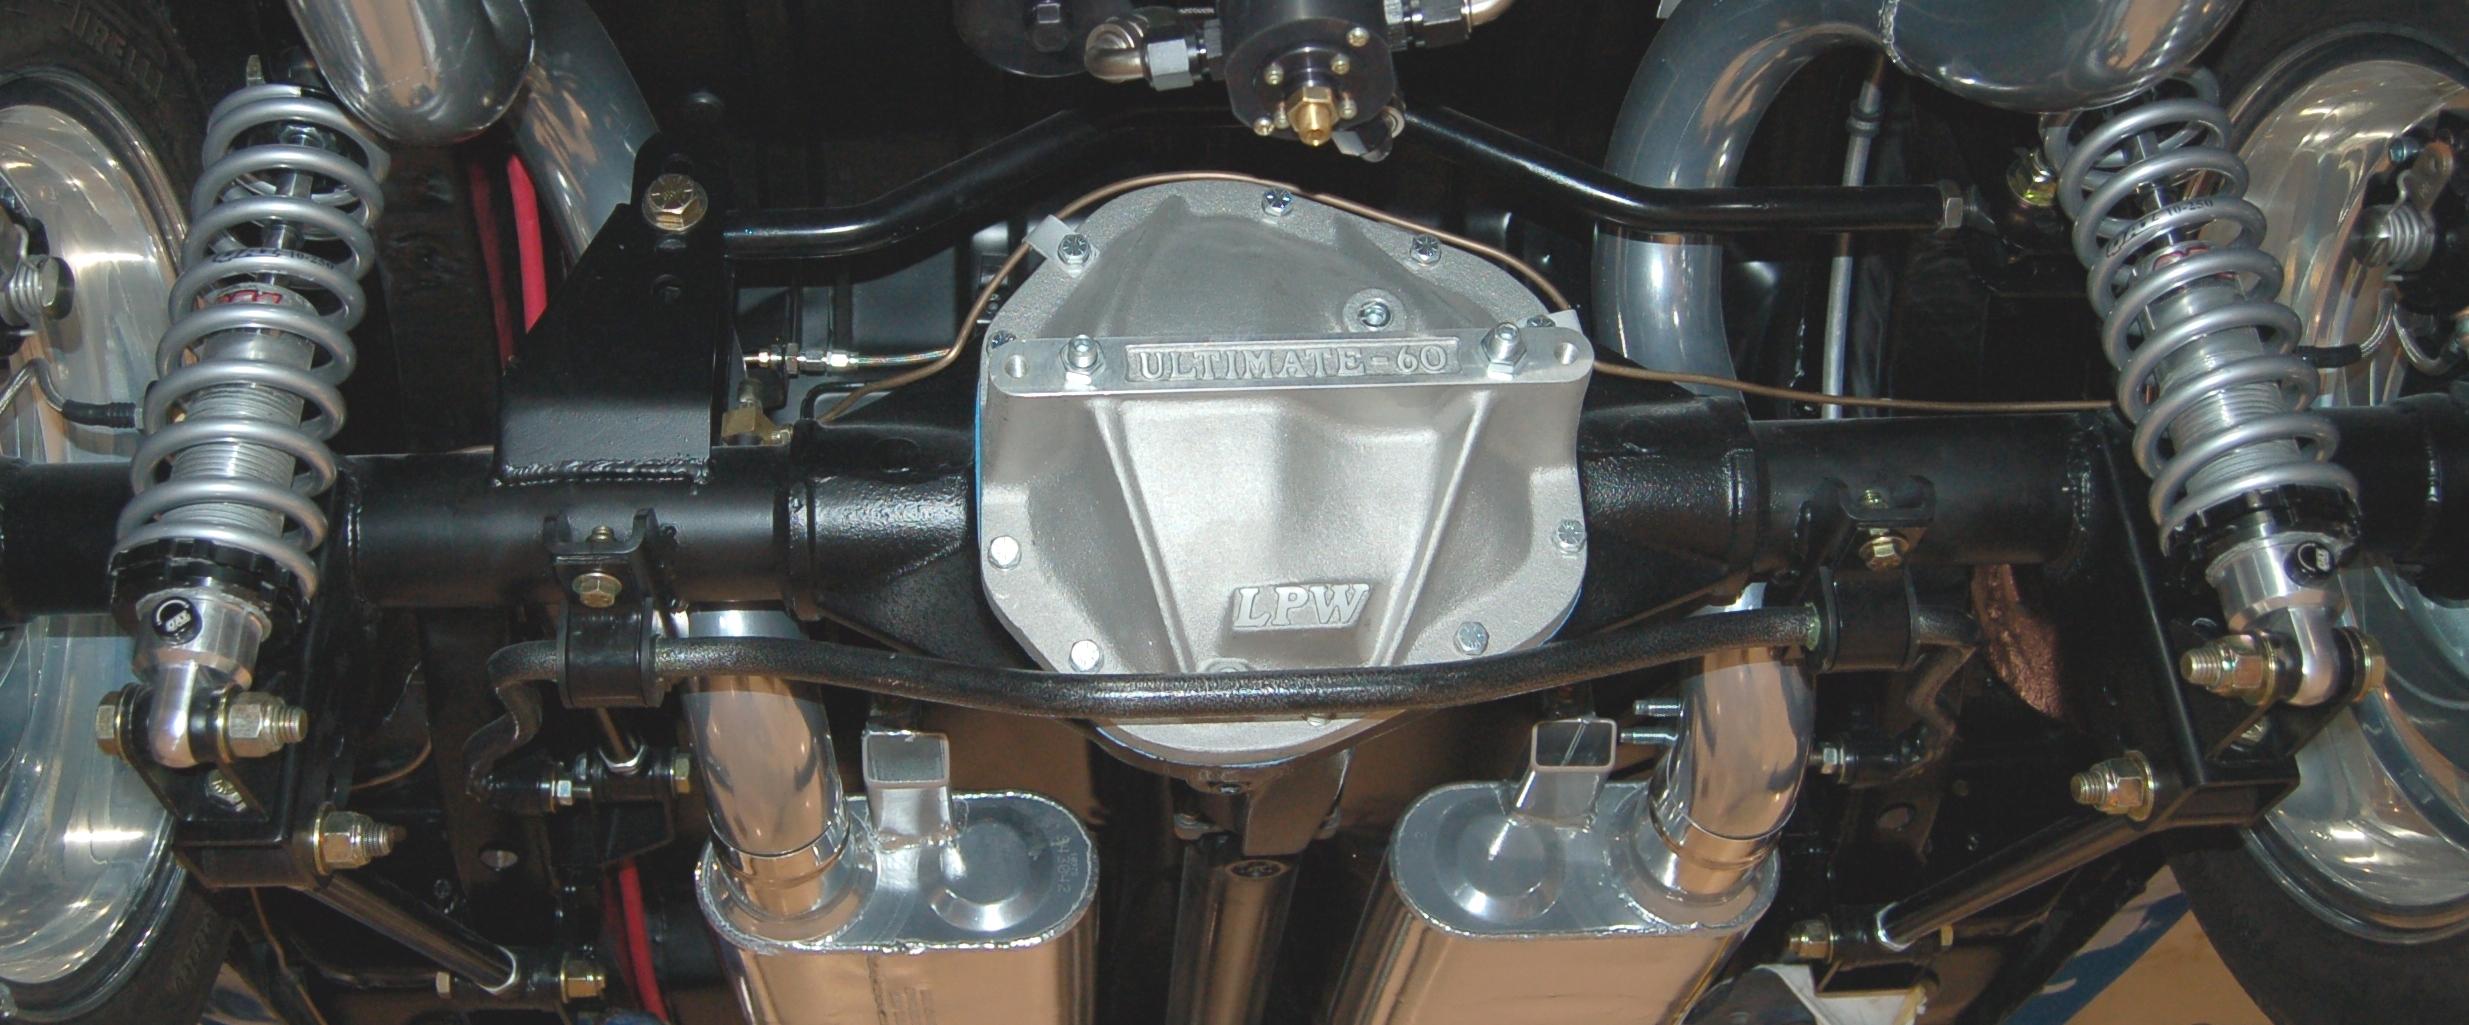 4-Link MOPAR Coil-Over Rear Suspension Systems